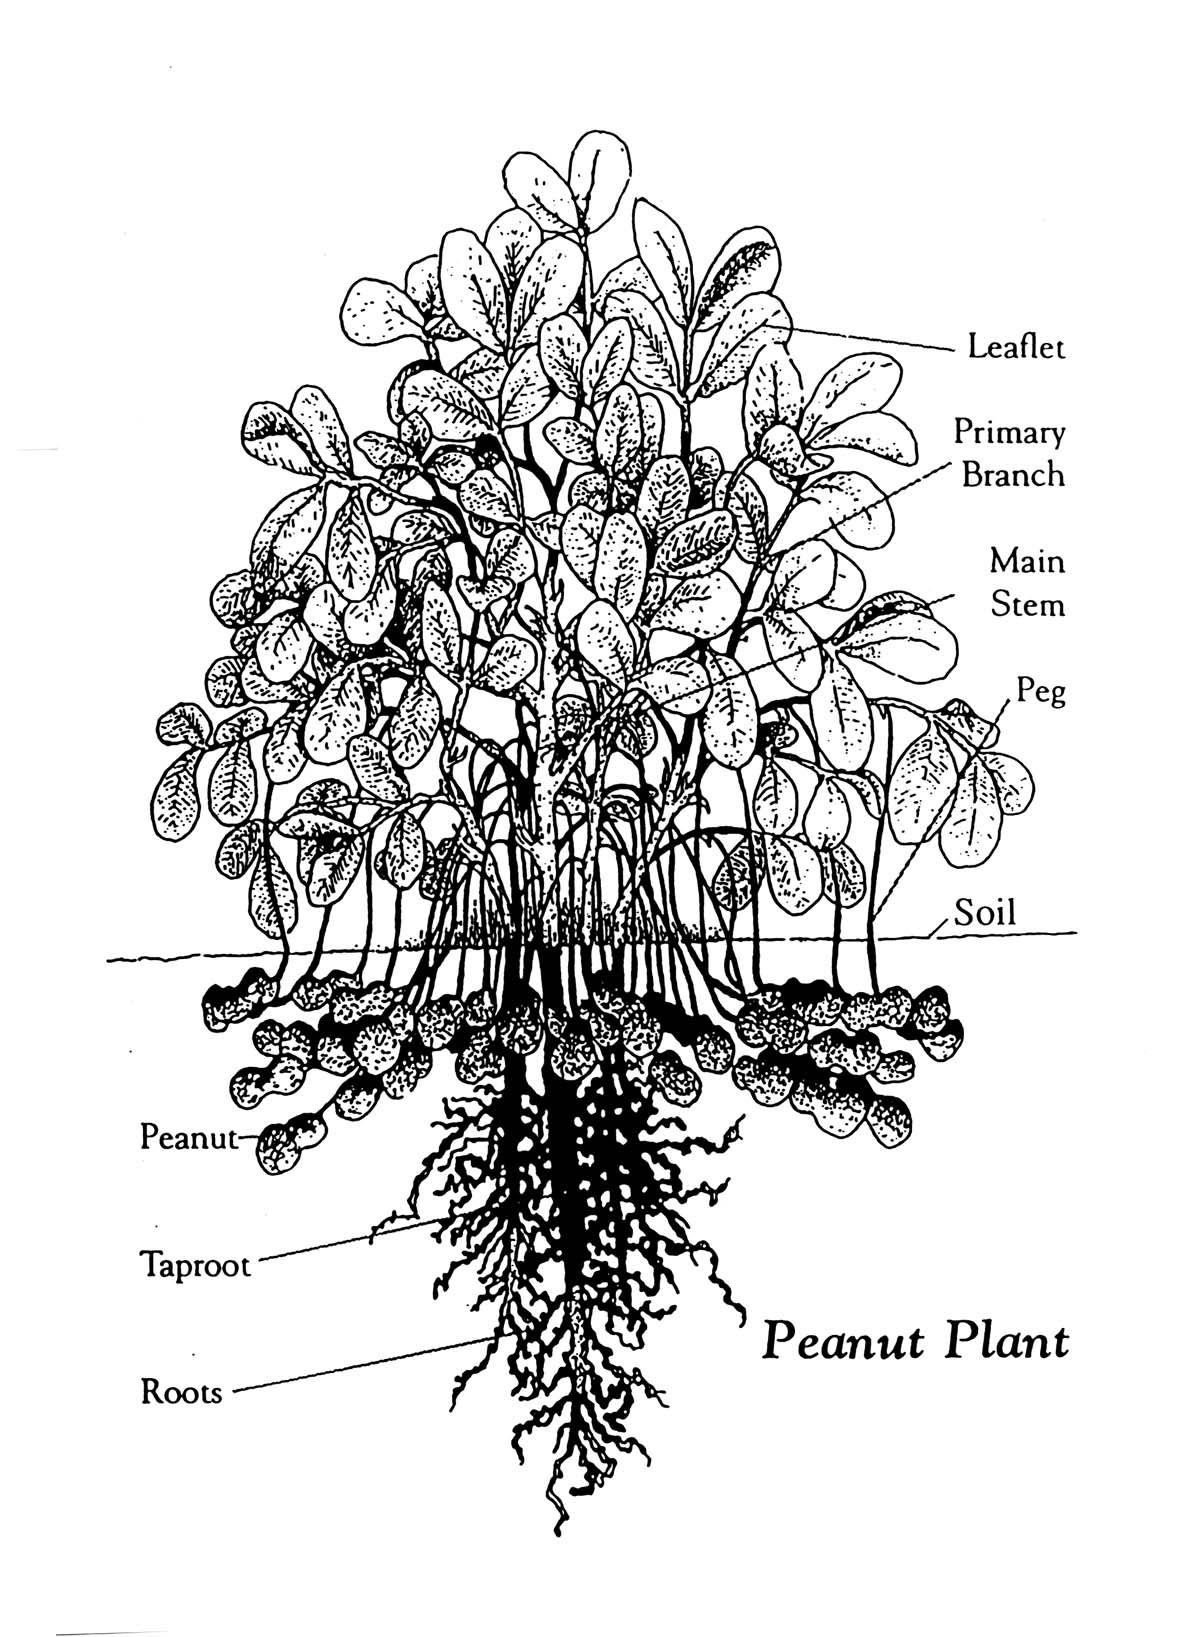 George washington carver diagram of peanut plant these are george washington carver diagram of peanut plant these are growing randomly in my yard ccuart Image collections